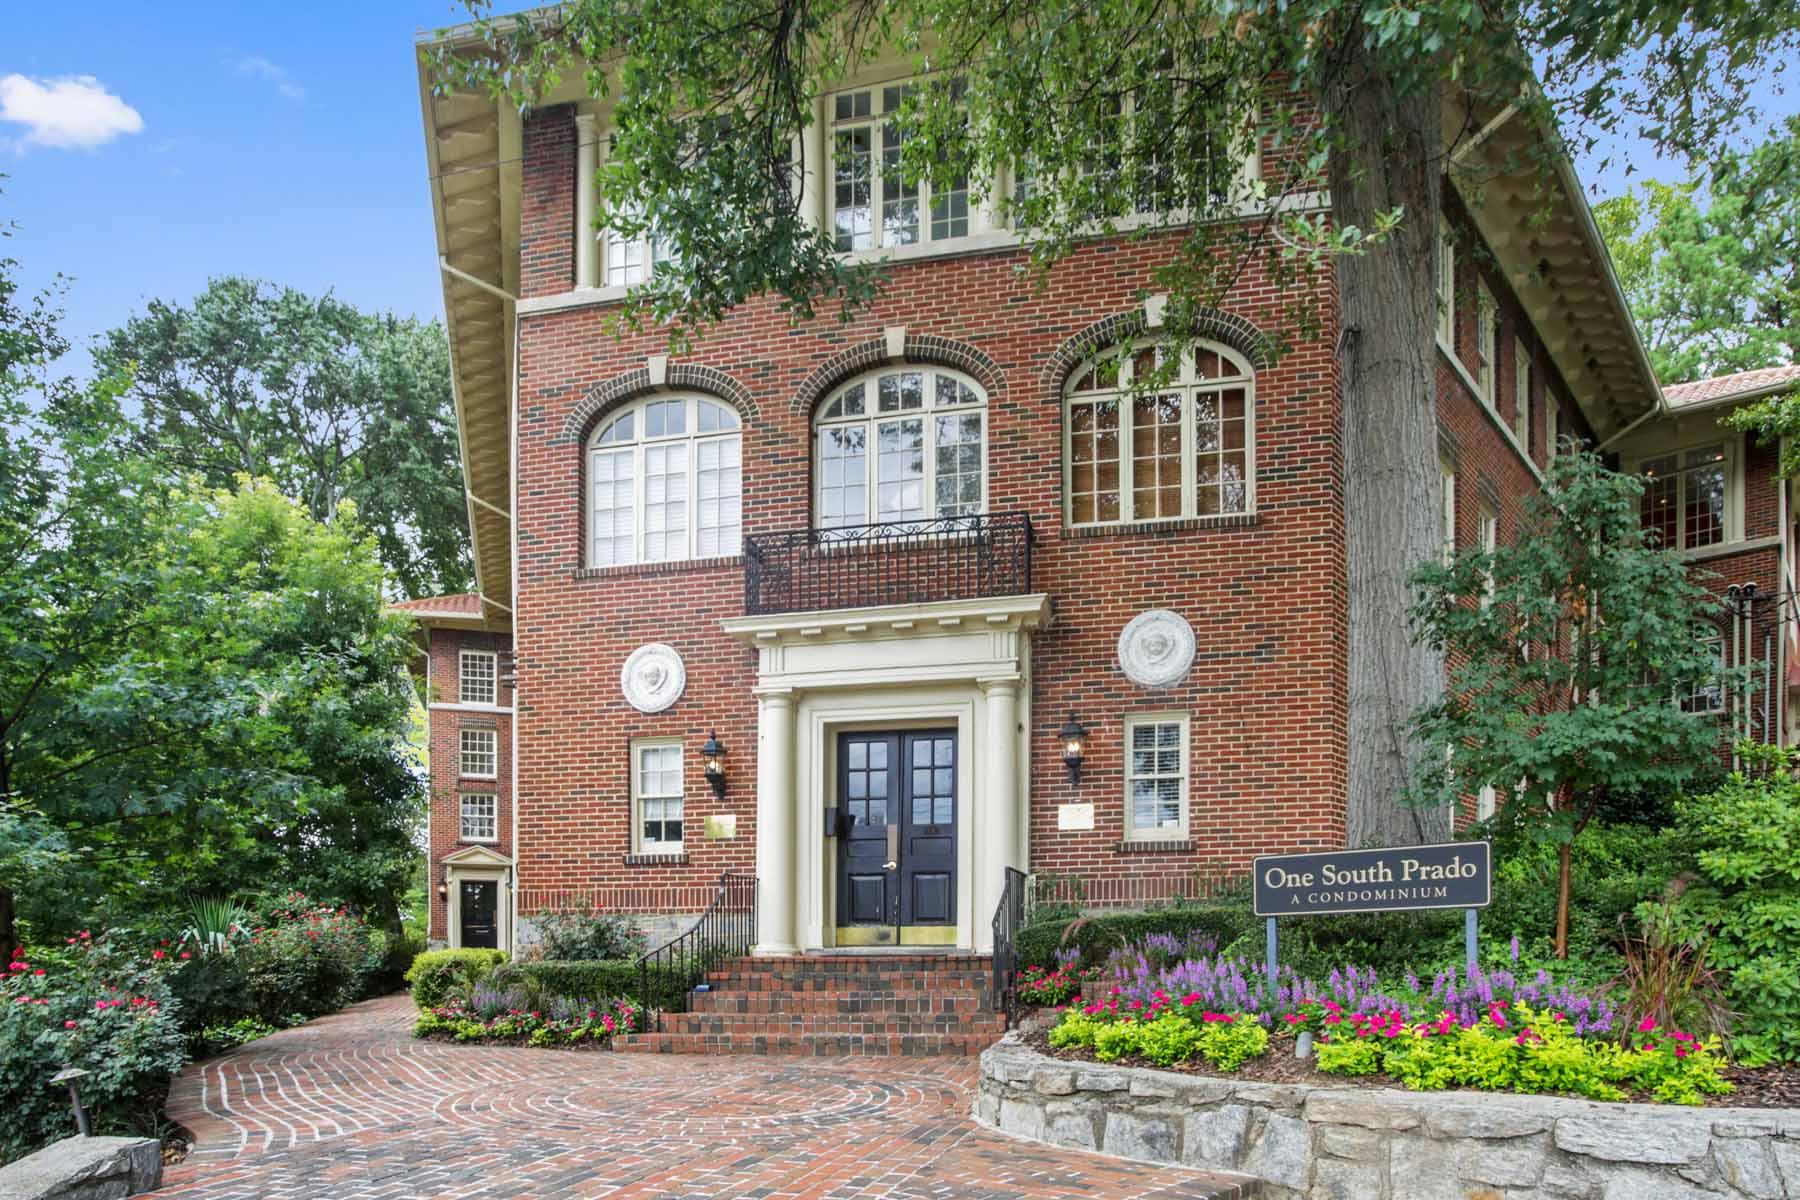 Condominium for Sale at A slice of Europe in Ansley Park. 1 S Prado NE No. 5A Ansley Park, Atlanta, Georgia, 30309 United States